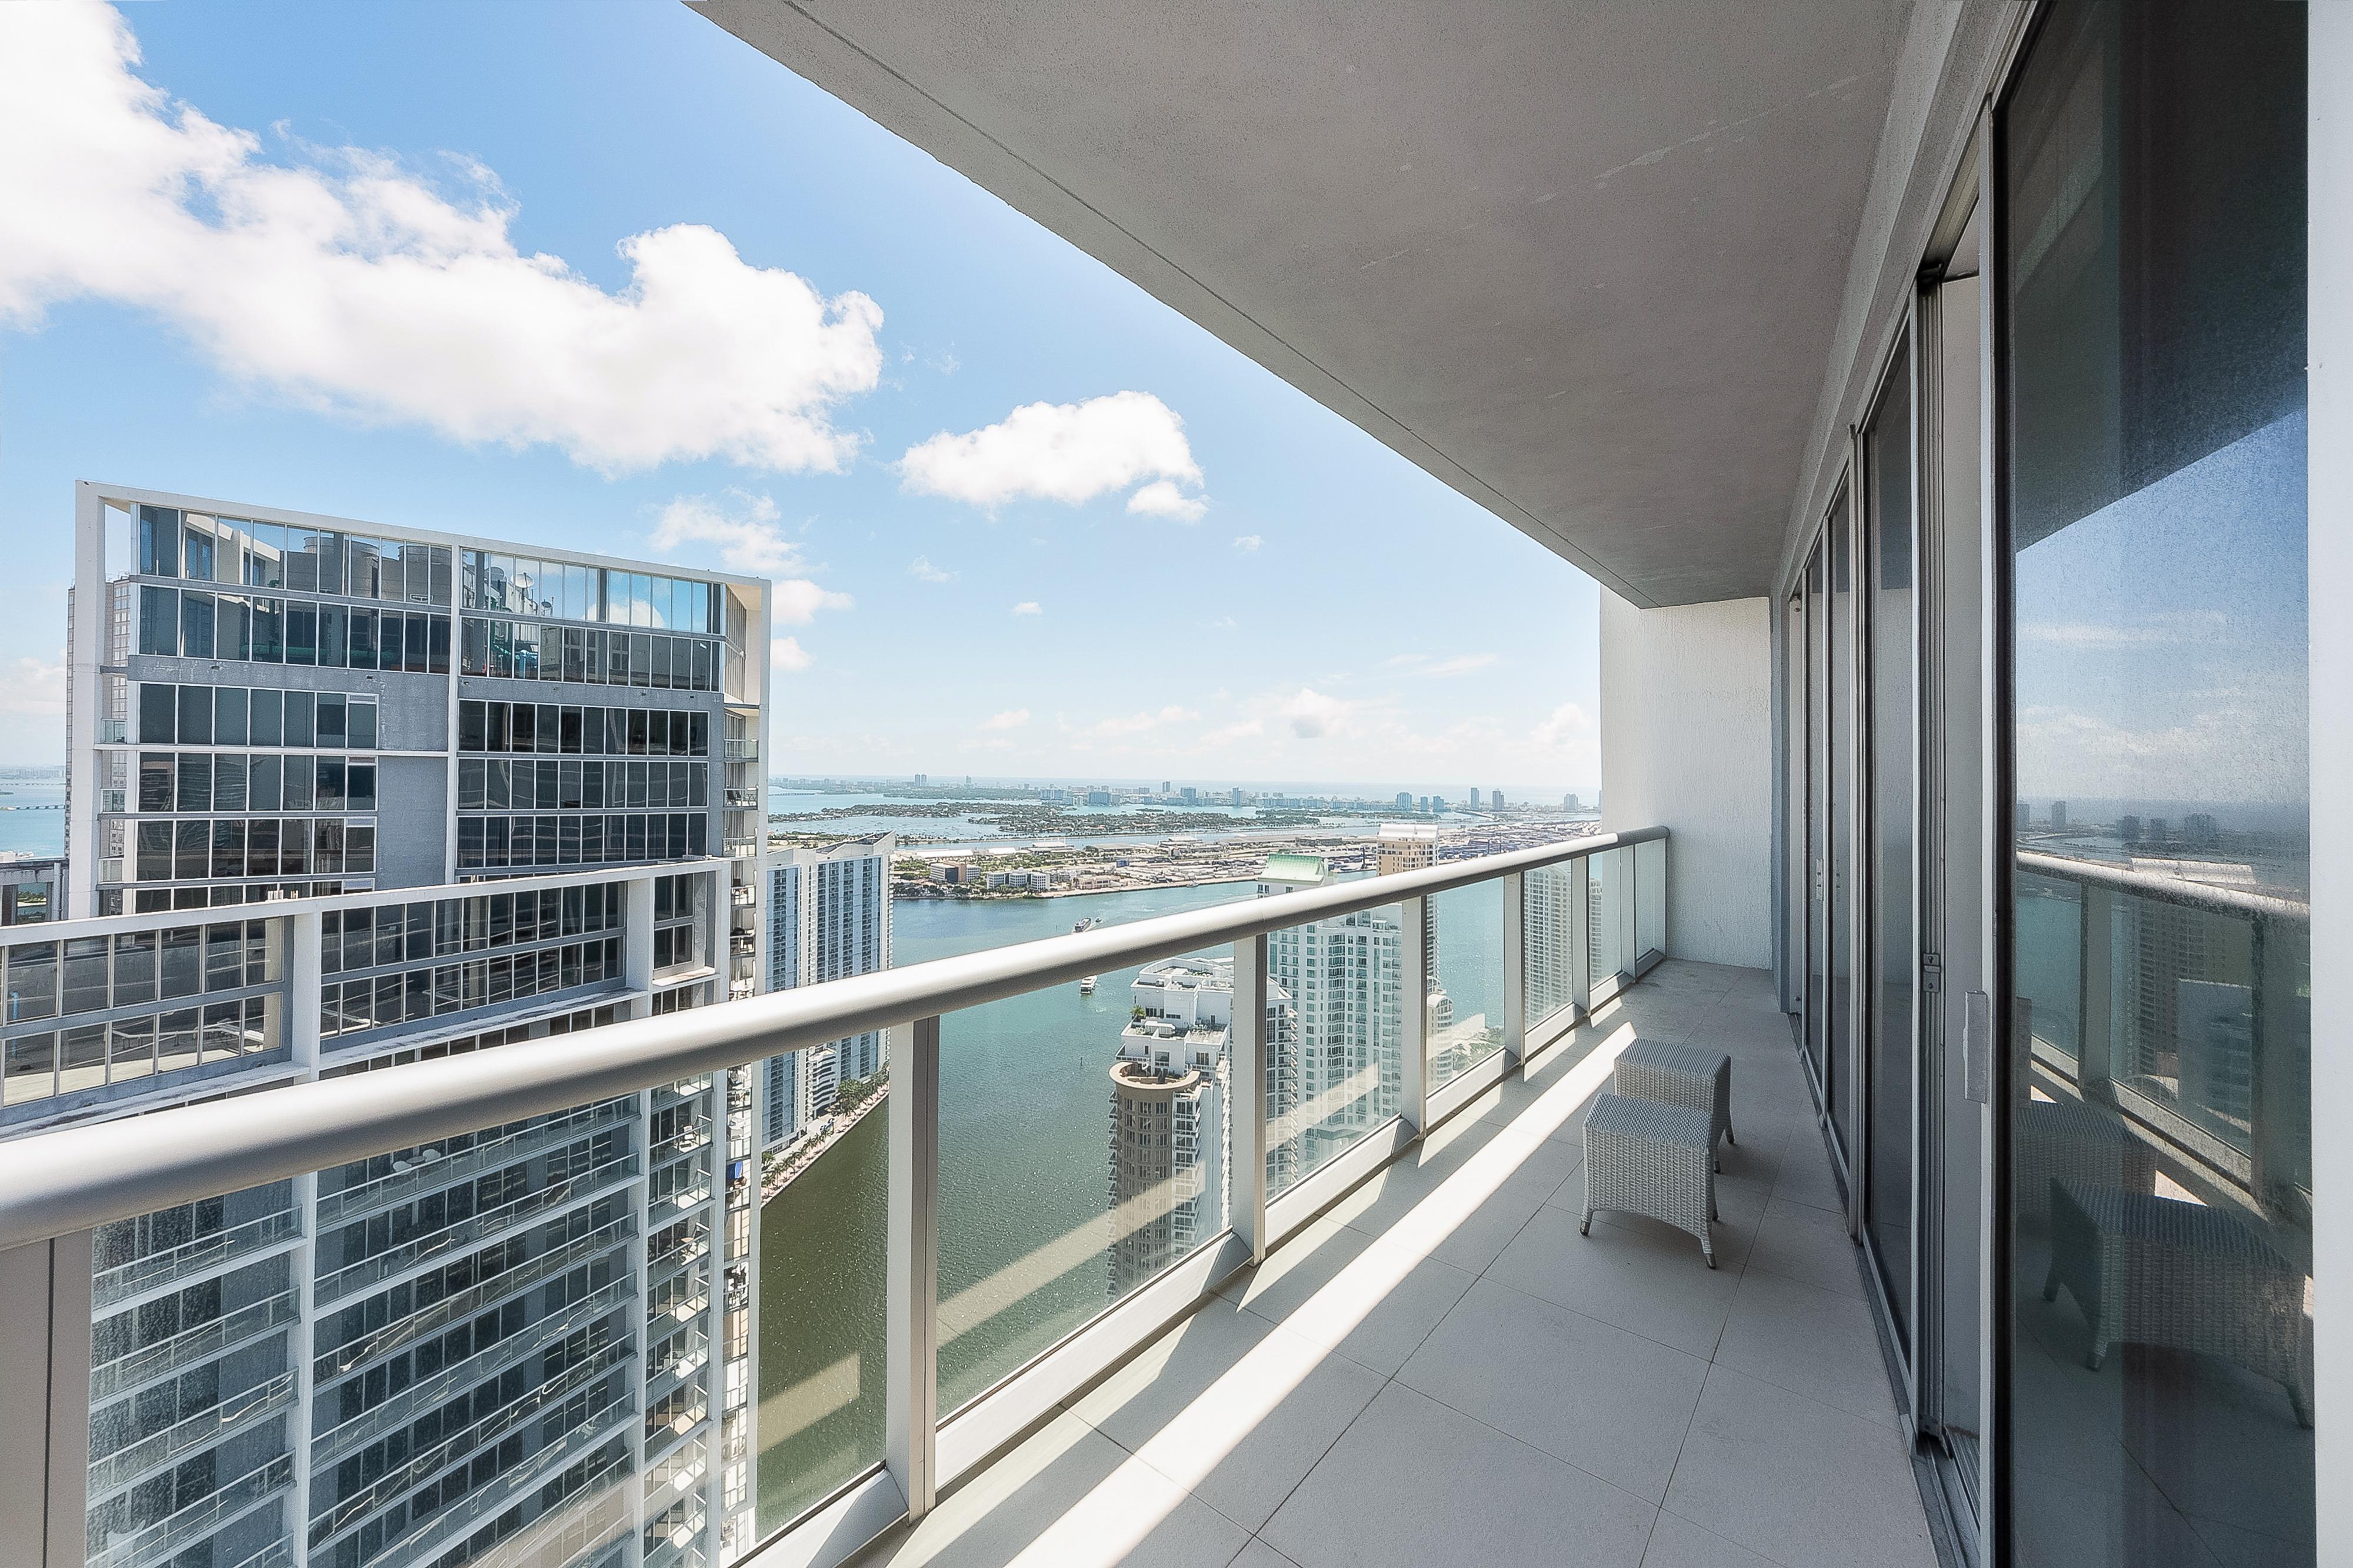 Condominium for Sale at 495 Brickell Ave #Ph5710 495 Brickell Ave PH5710 Miami, Florida, 33131 United States